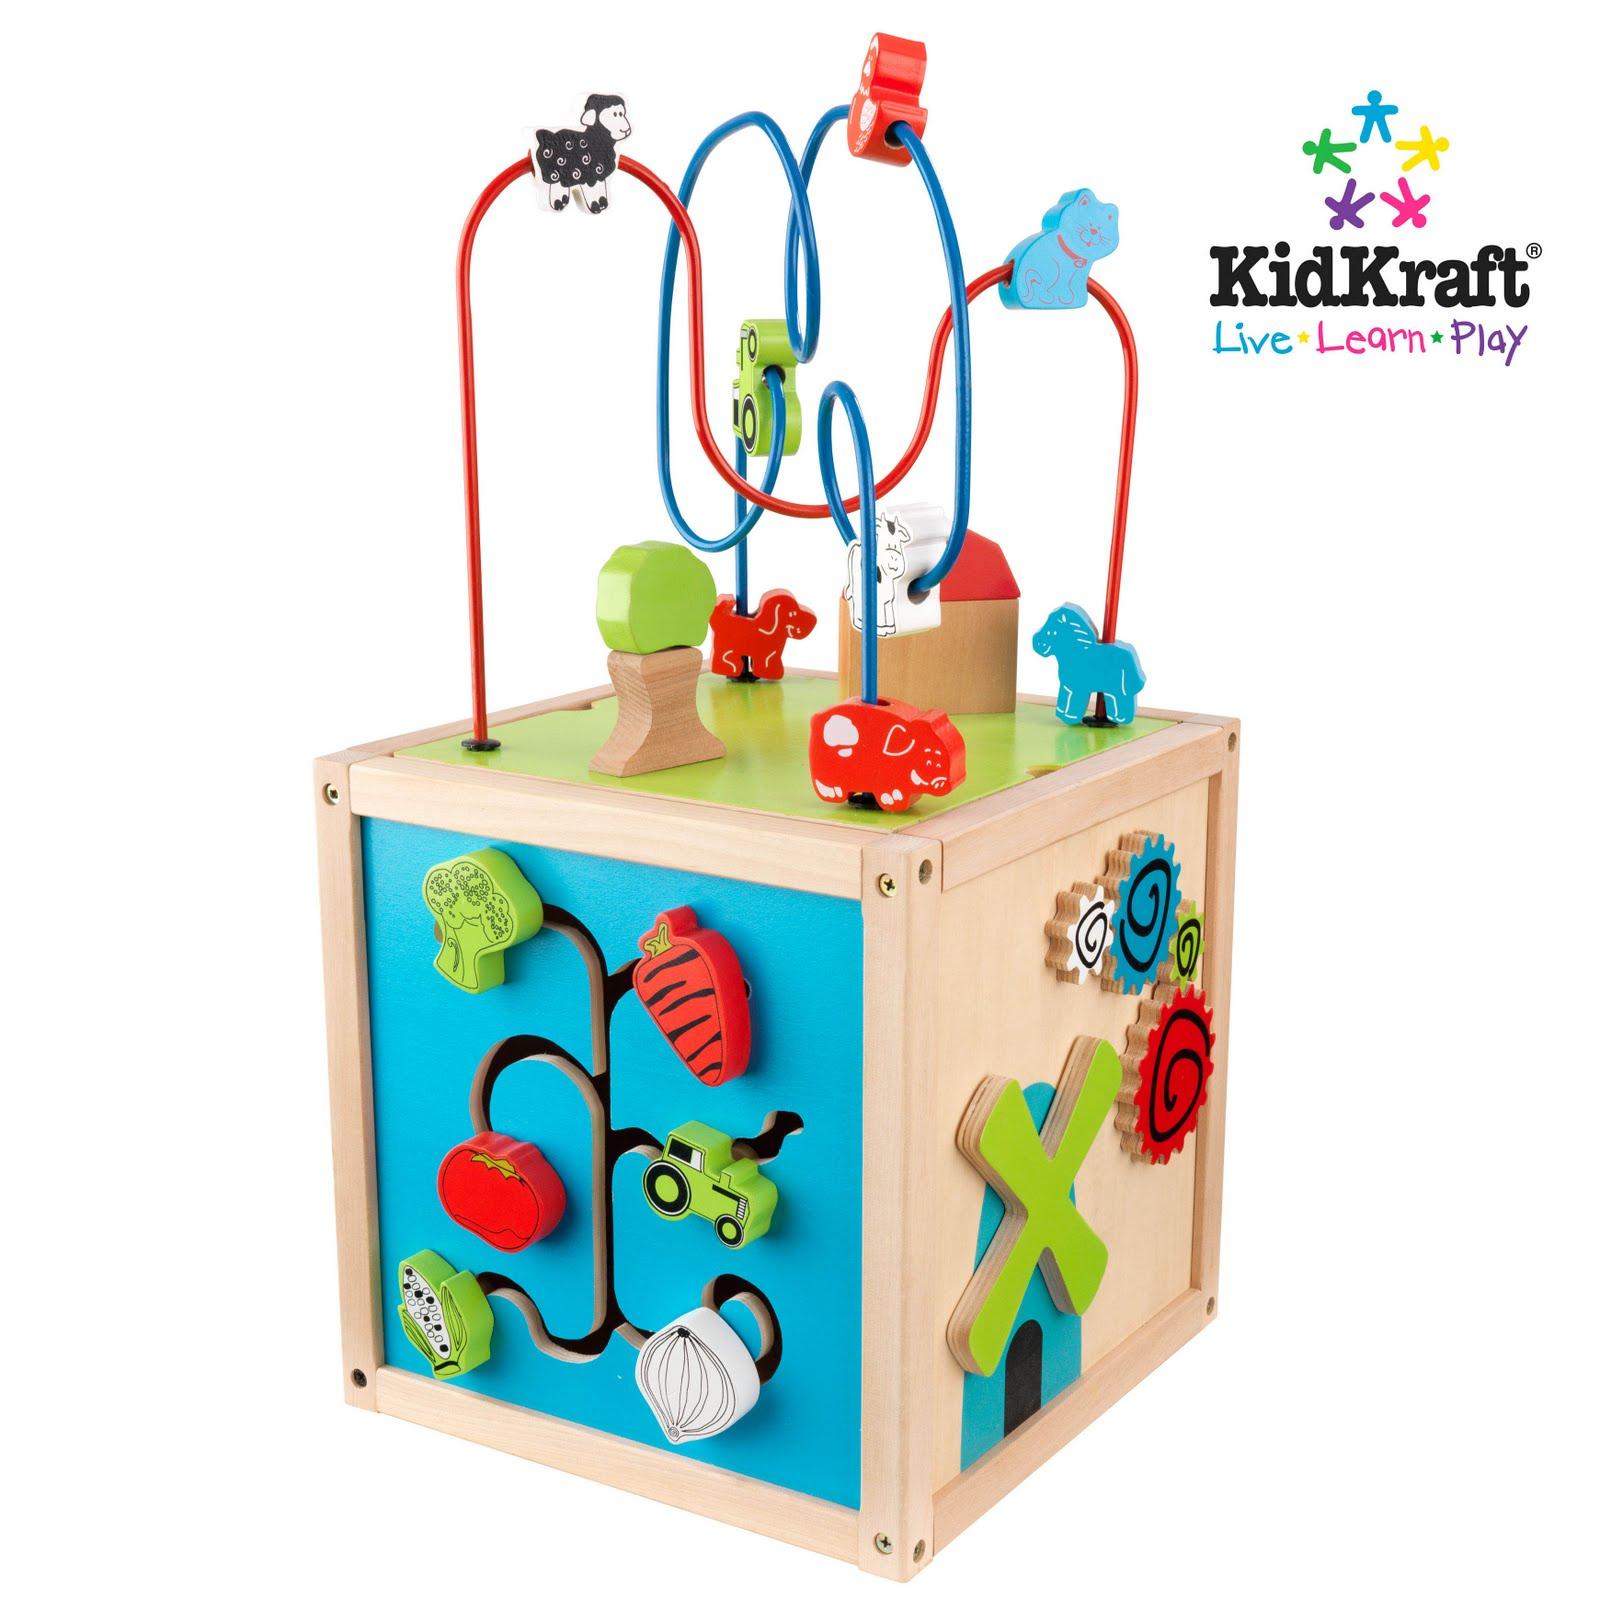 Children's Wooden Toys Toy Play Kitchen Furniture Dollhouse KidKraft Teamson Guidecraft Reviews ...